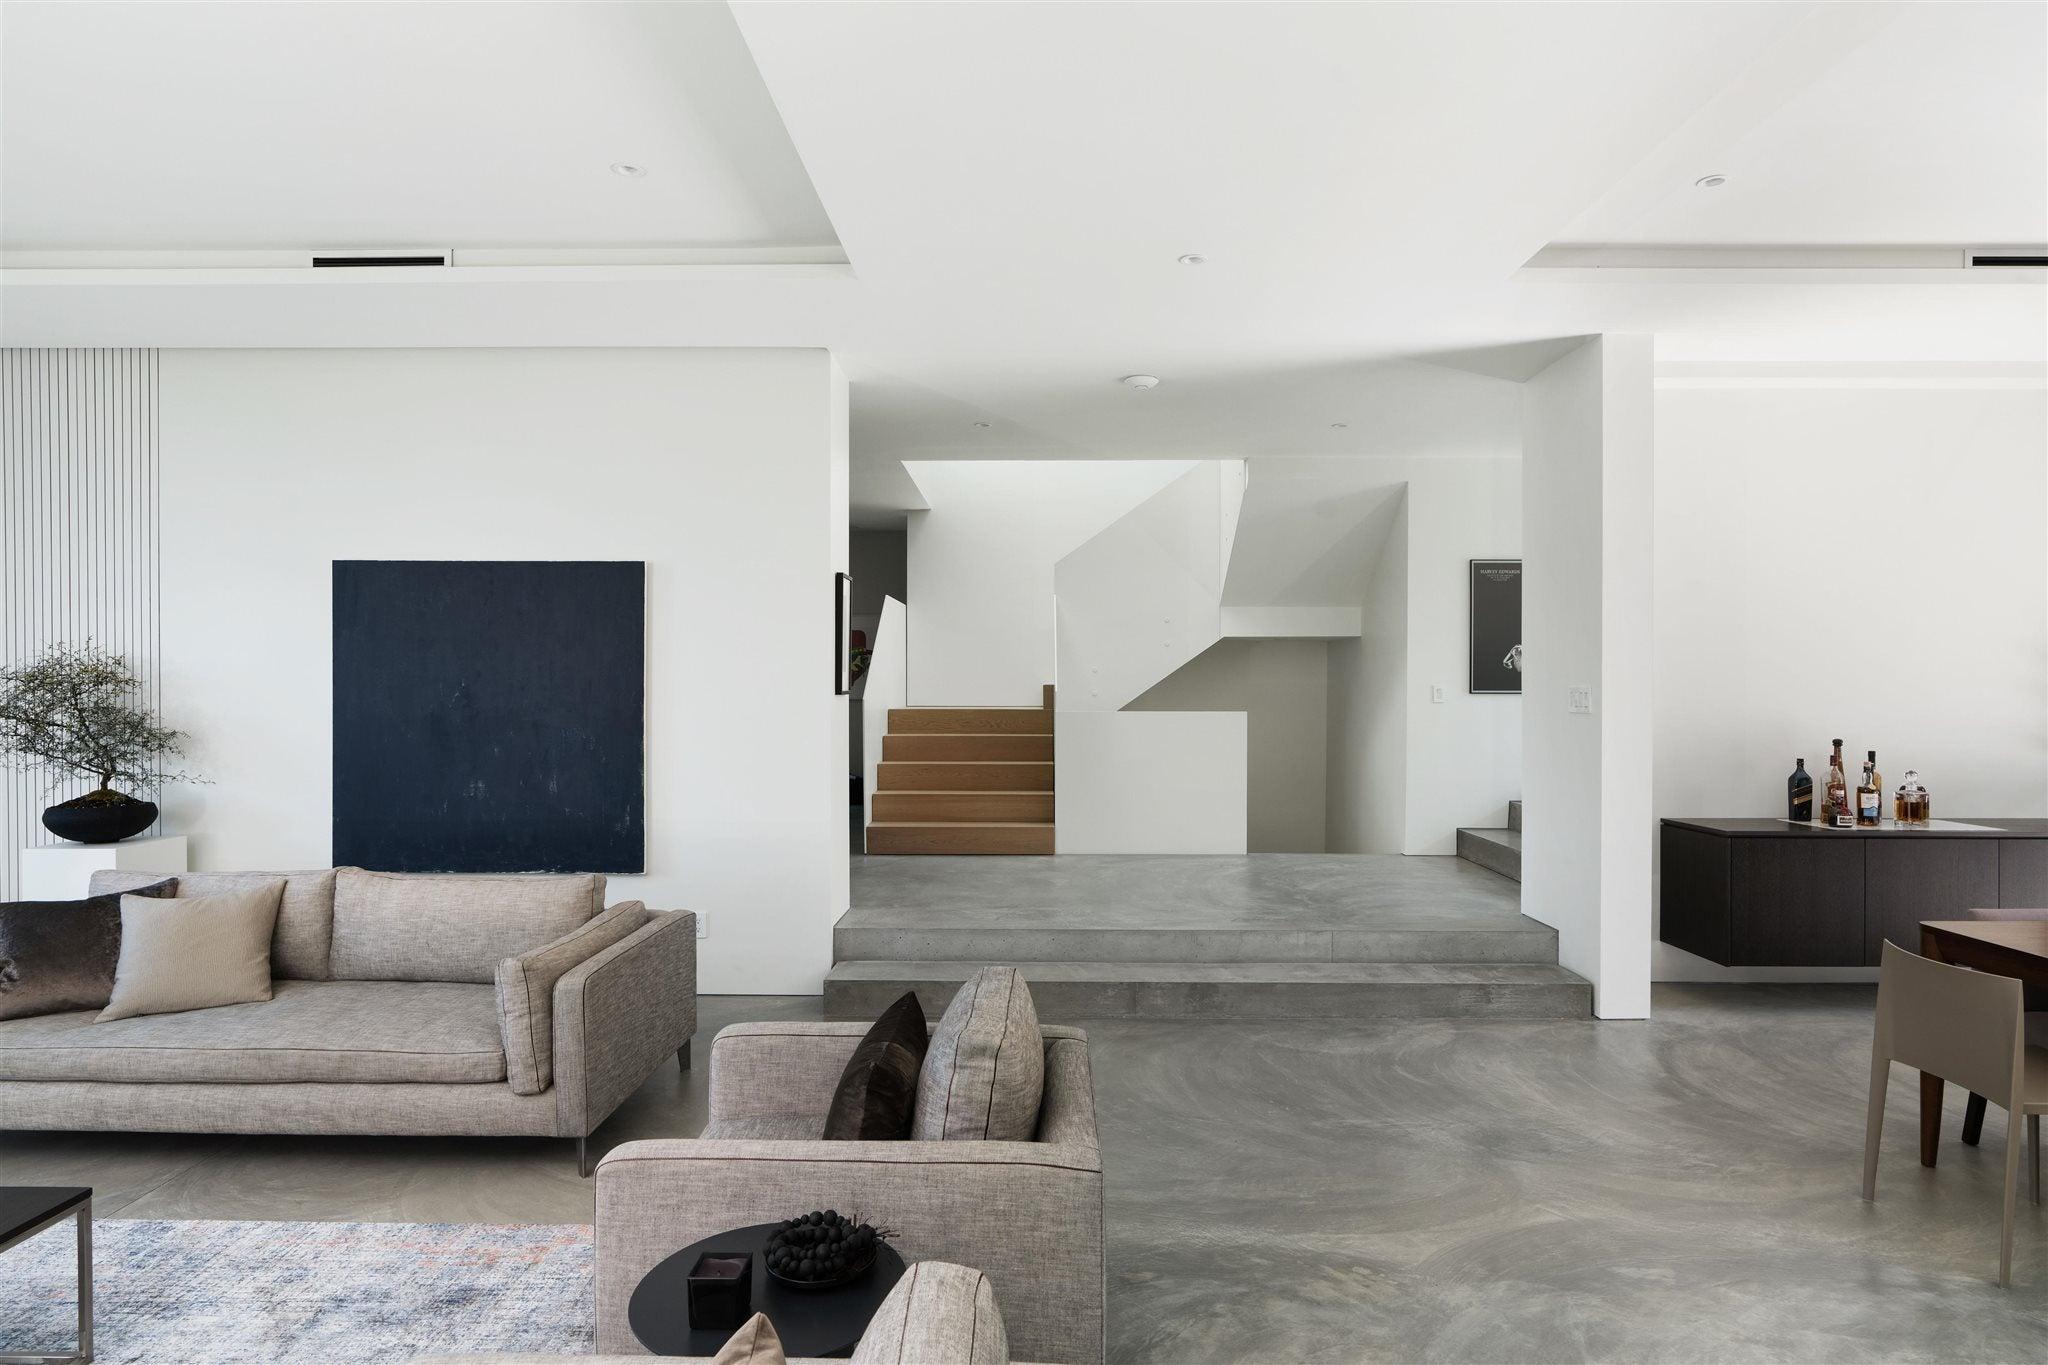 276 SANDRINGHAM CRESCENT - Upper Lonsdale House/Single Family for sale, 7 Bedrooms (R2617703) - #10